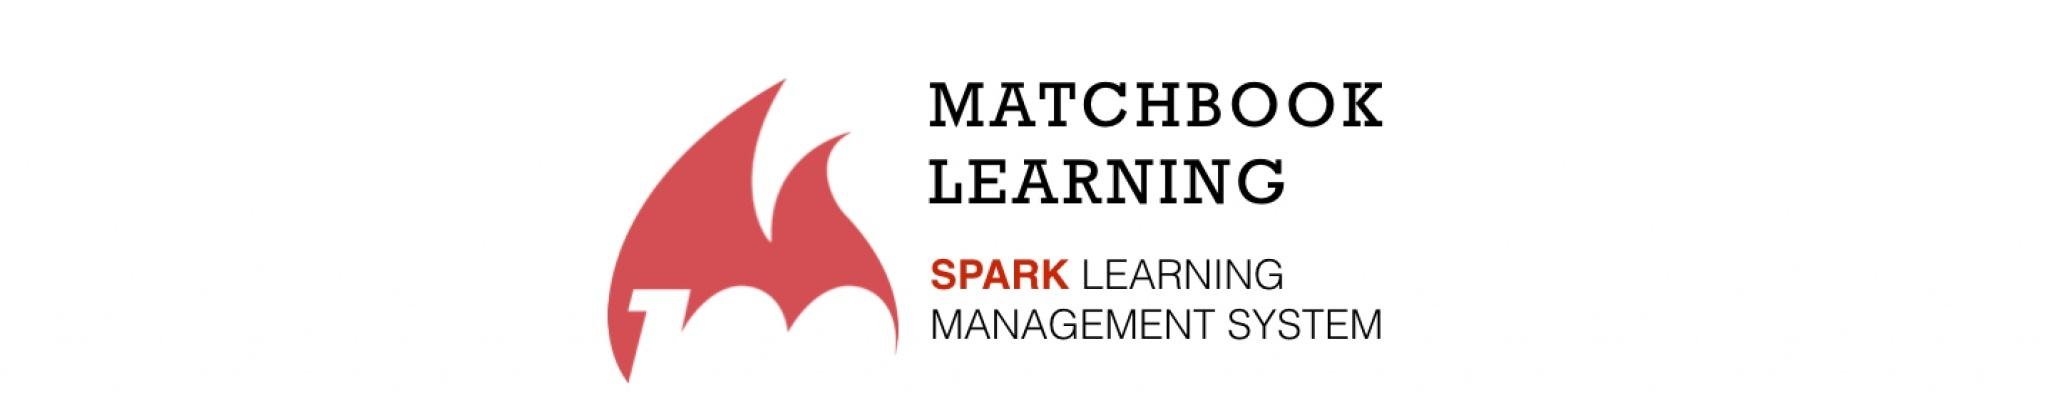 Matchbook Learning Sparks Blended Learning